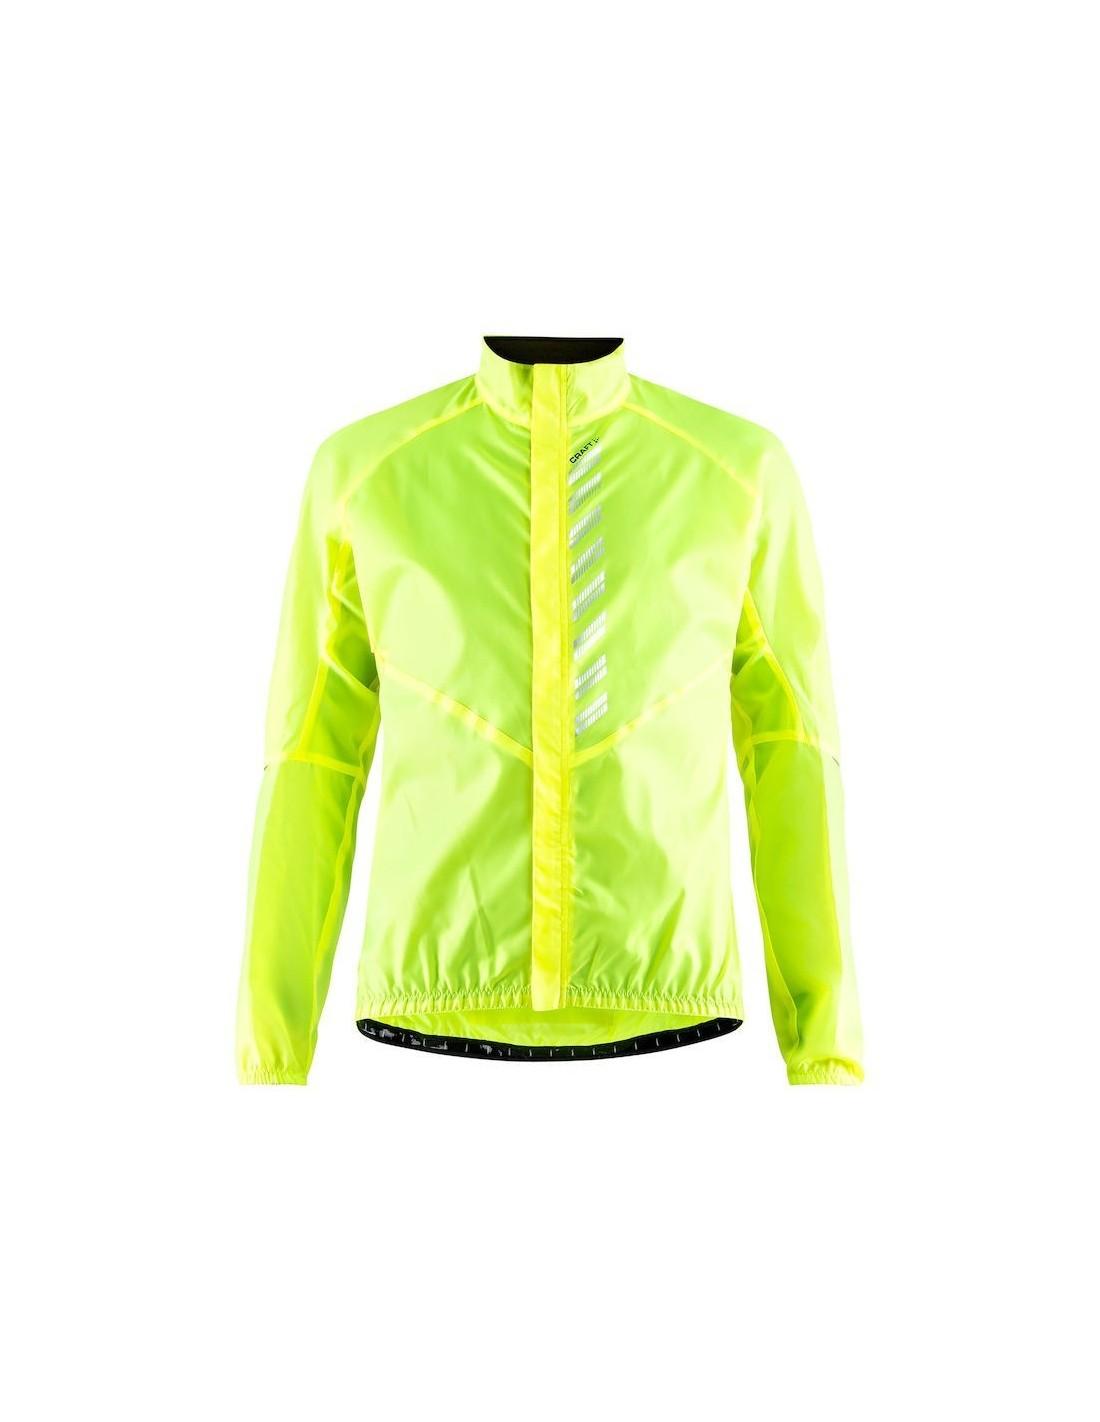 fc90d5d943969 Kurtka męska Craft Mist Wind Jacket, żółta - STSklep